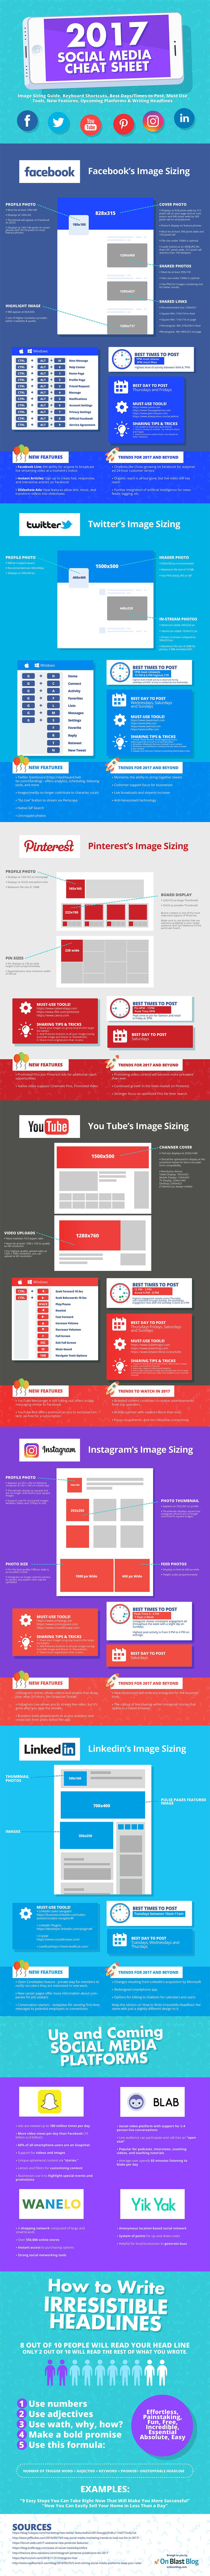 Social Media Cheat Sheet for 2017